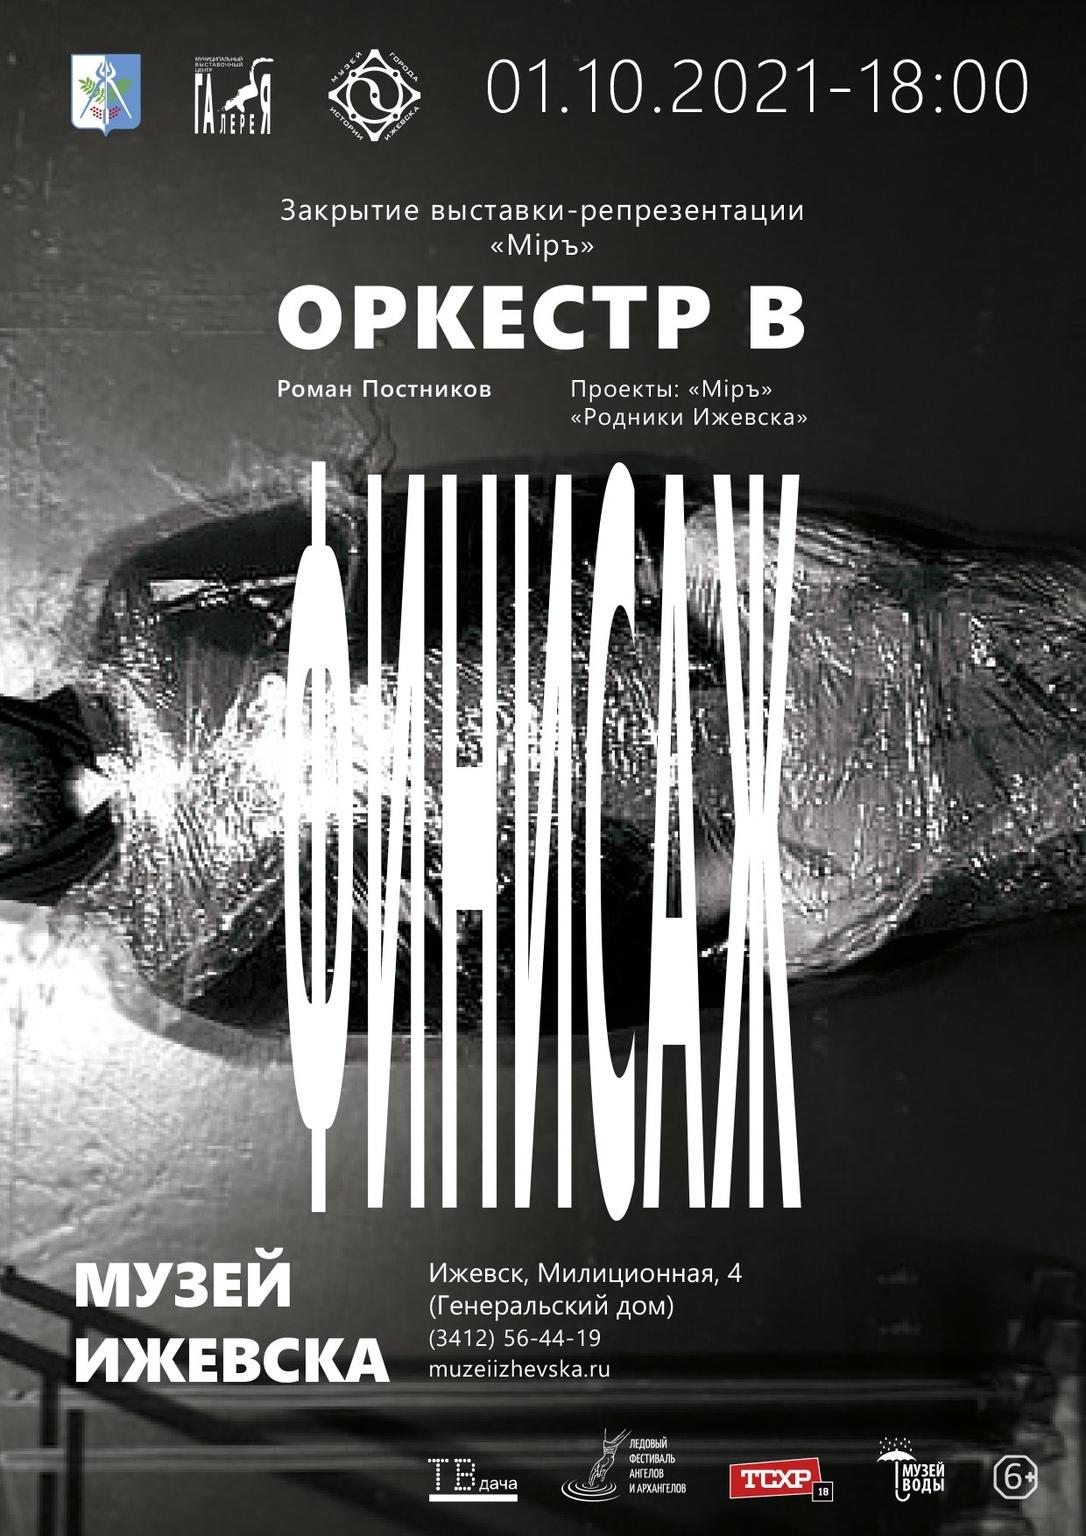 Закрытие выставки «Мiръ» в Музее Ижевска